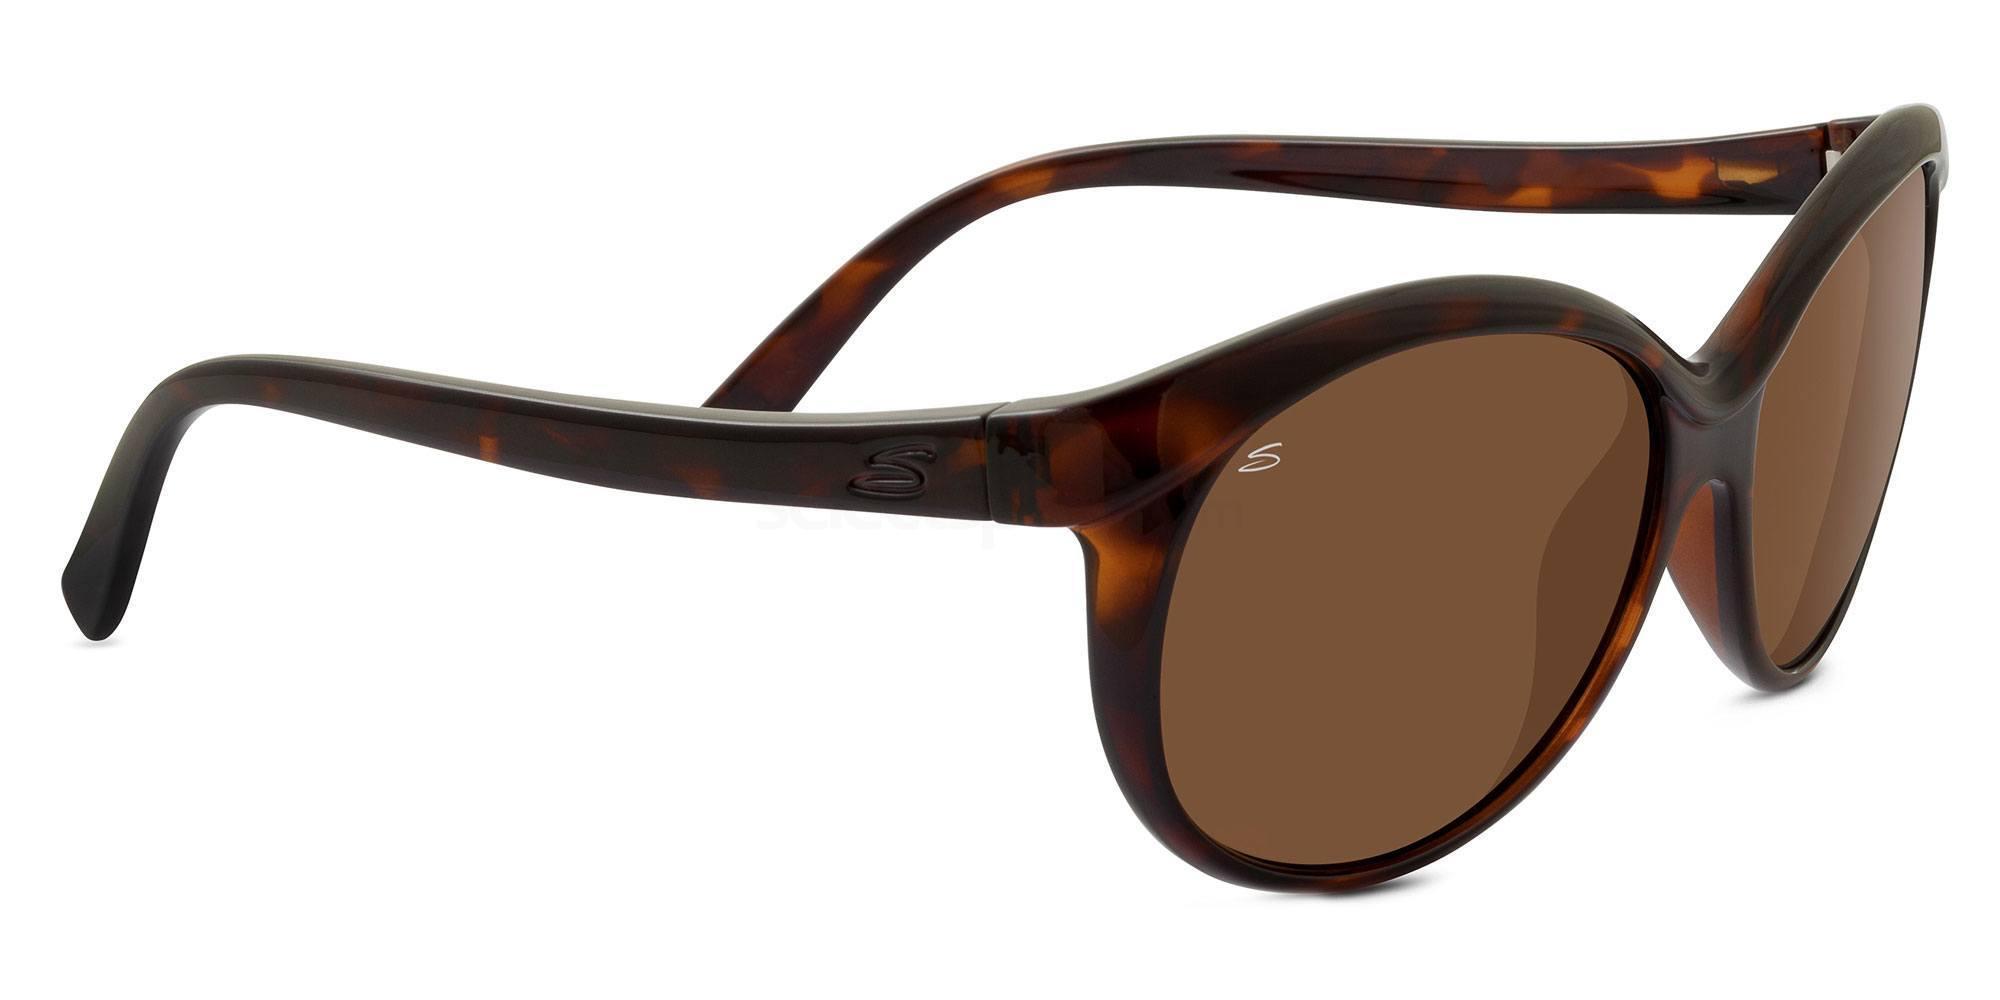 8188 Cosmopolitan CATERINA Sunglasses, Serengeti